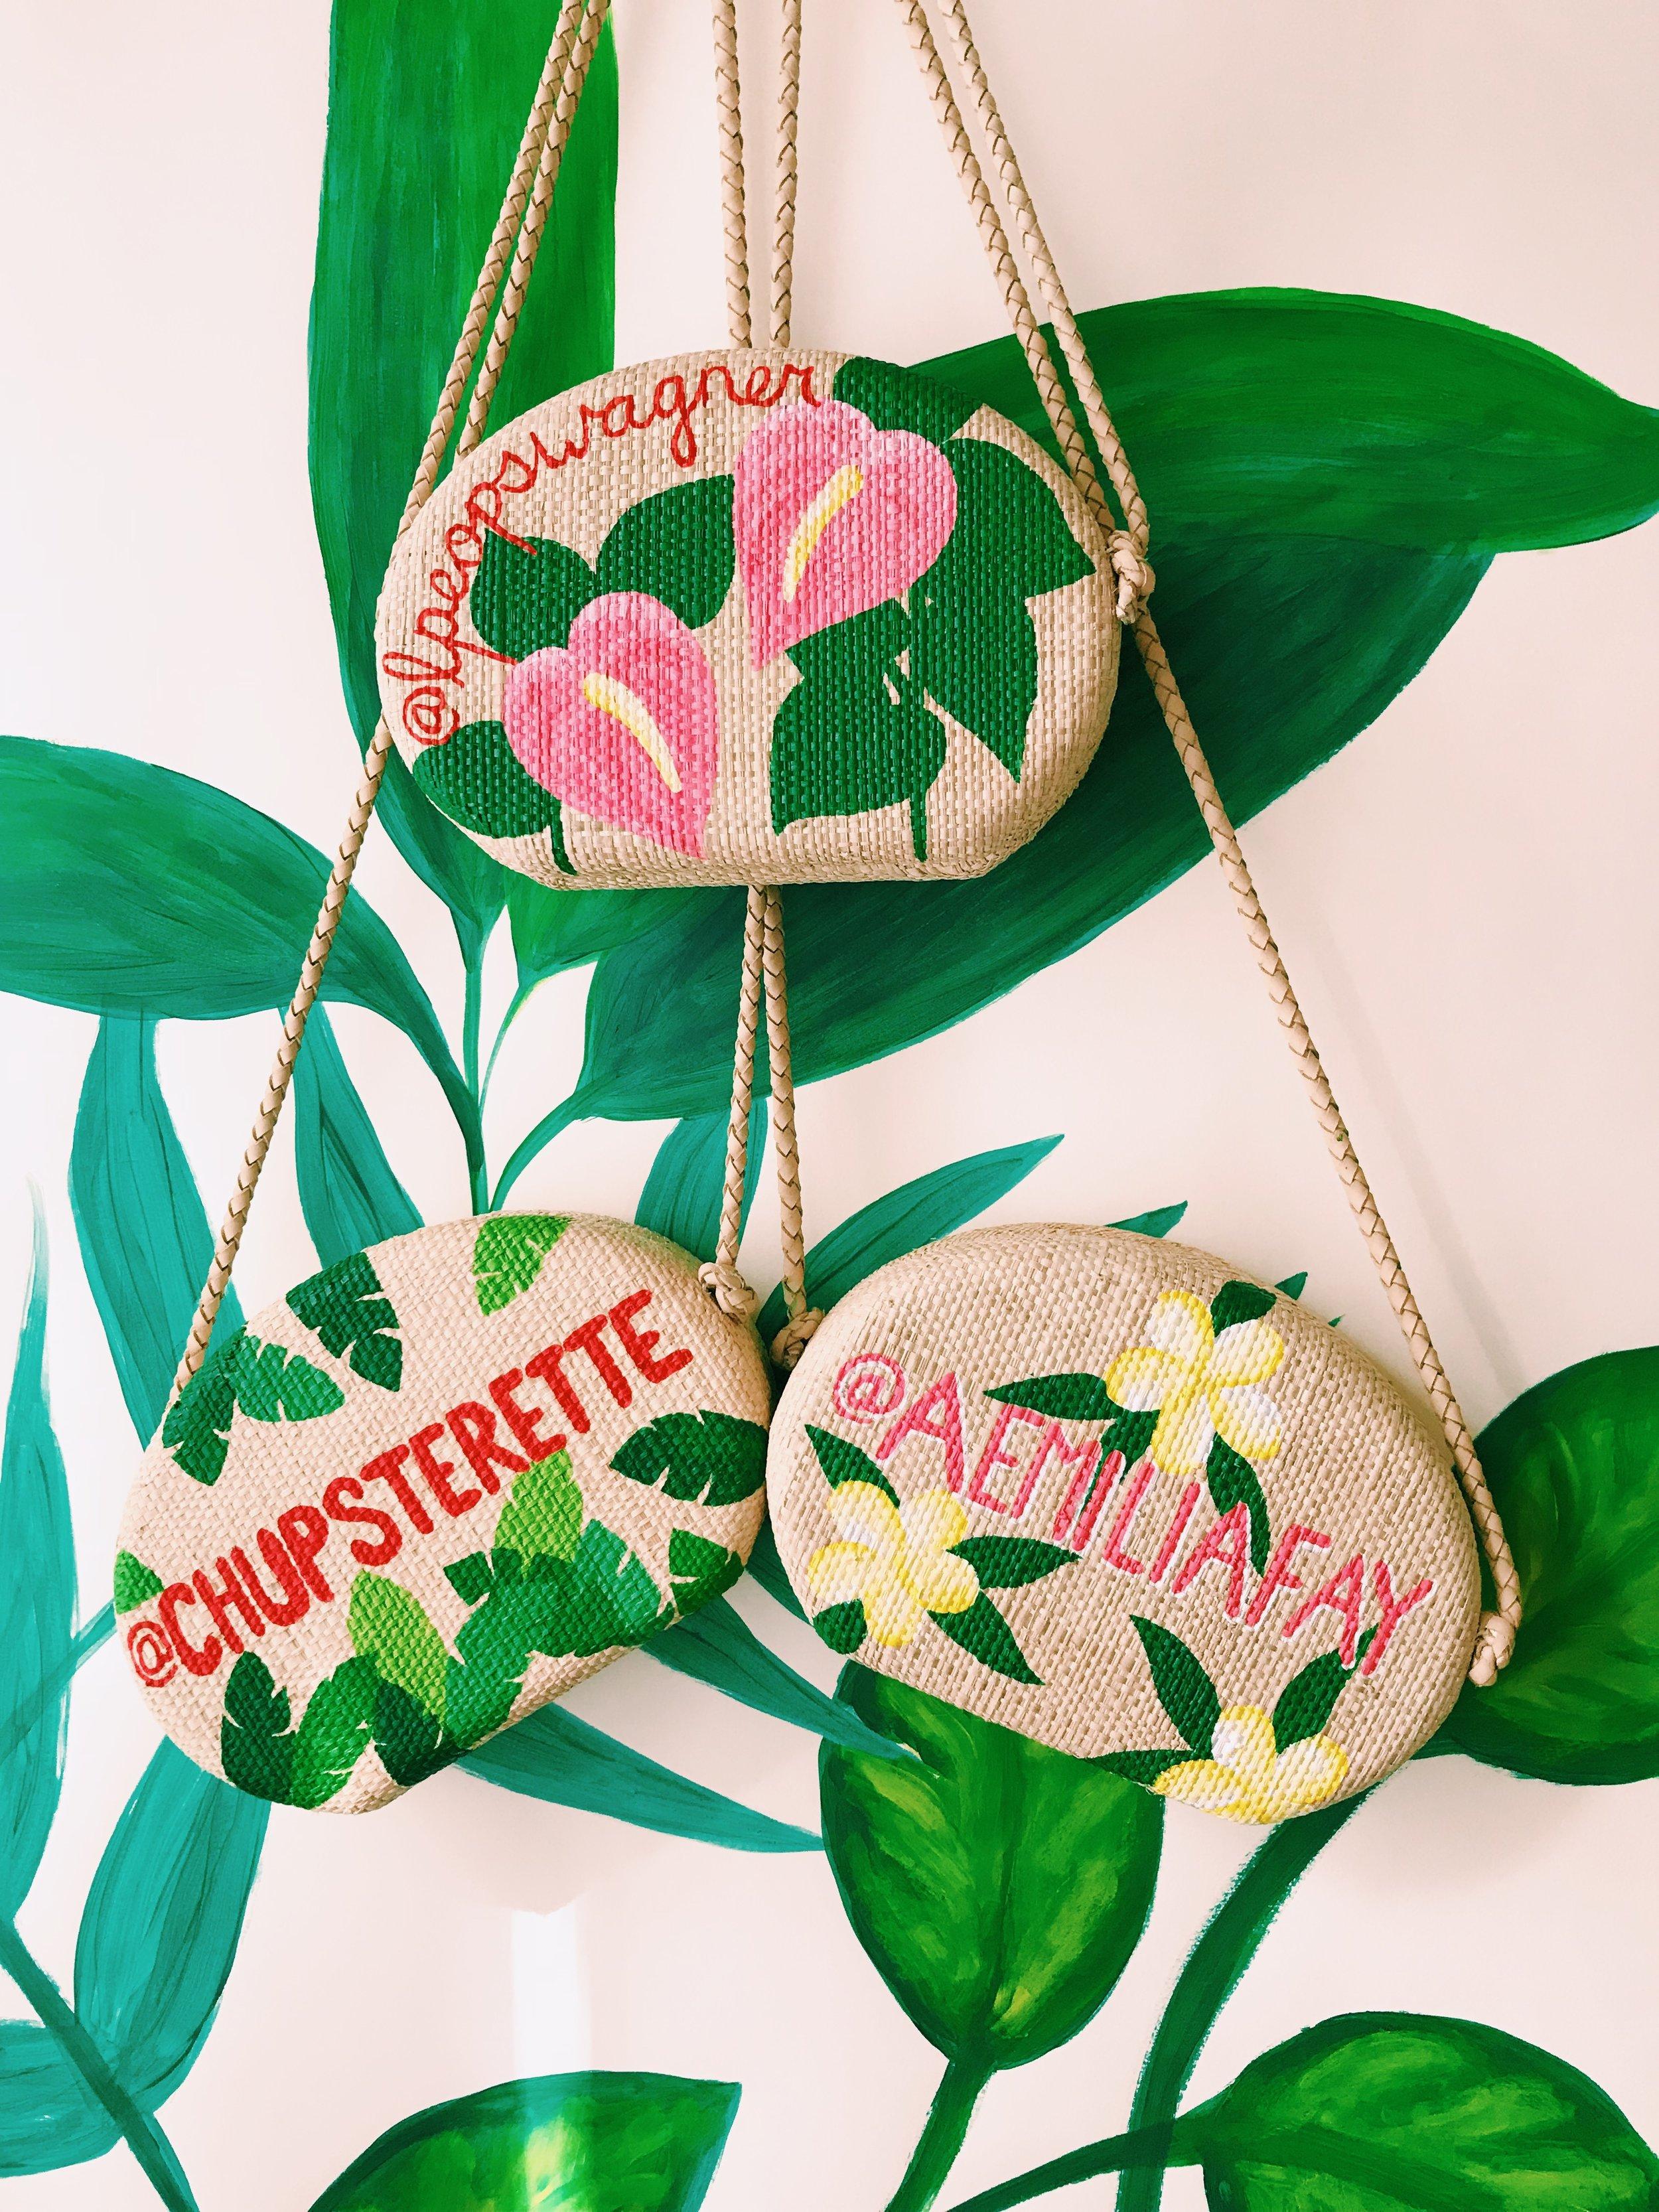 Schutz Shoes, Custom Bags, Editor + Influencer Gifting, 2017